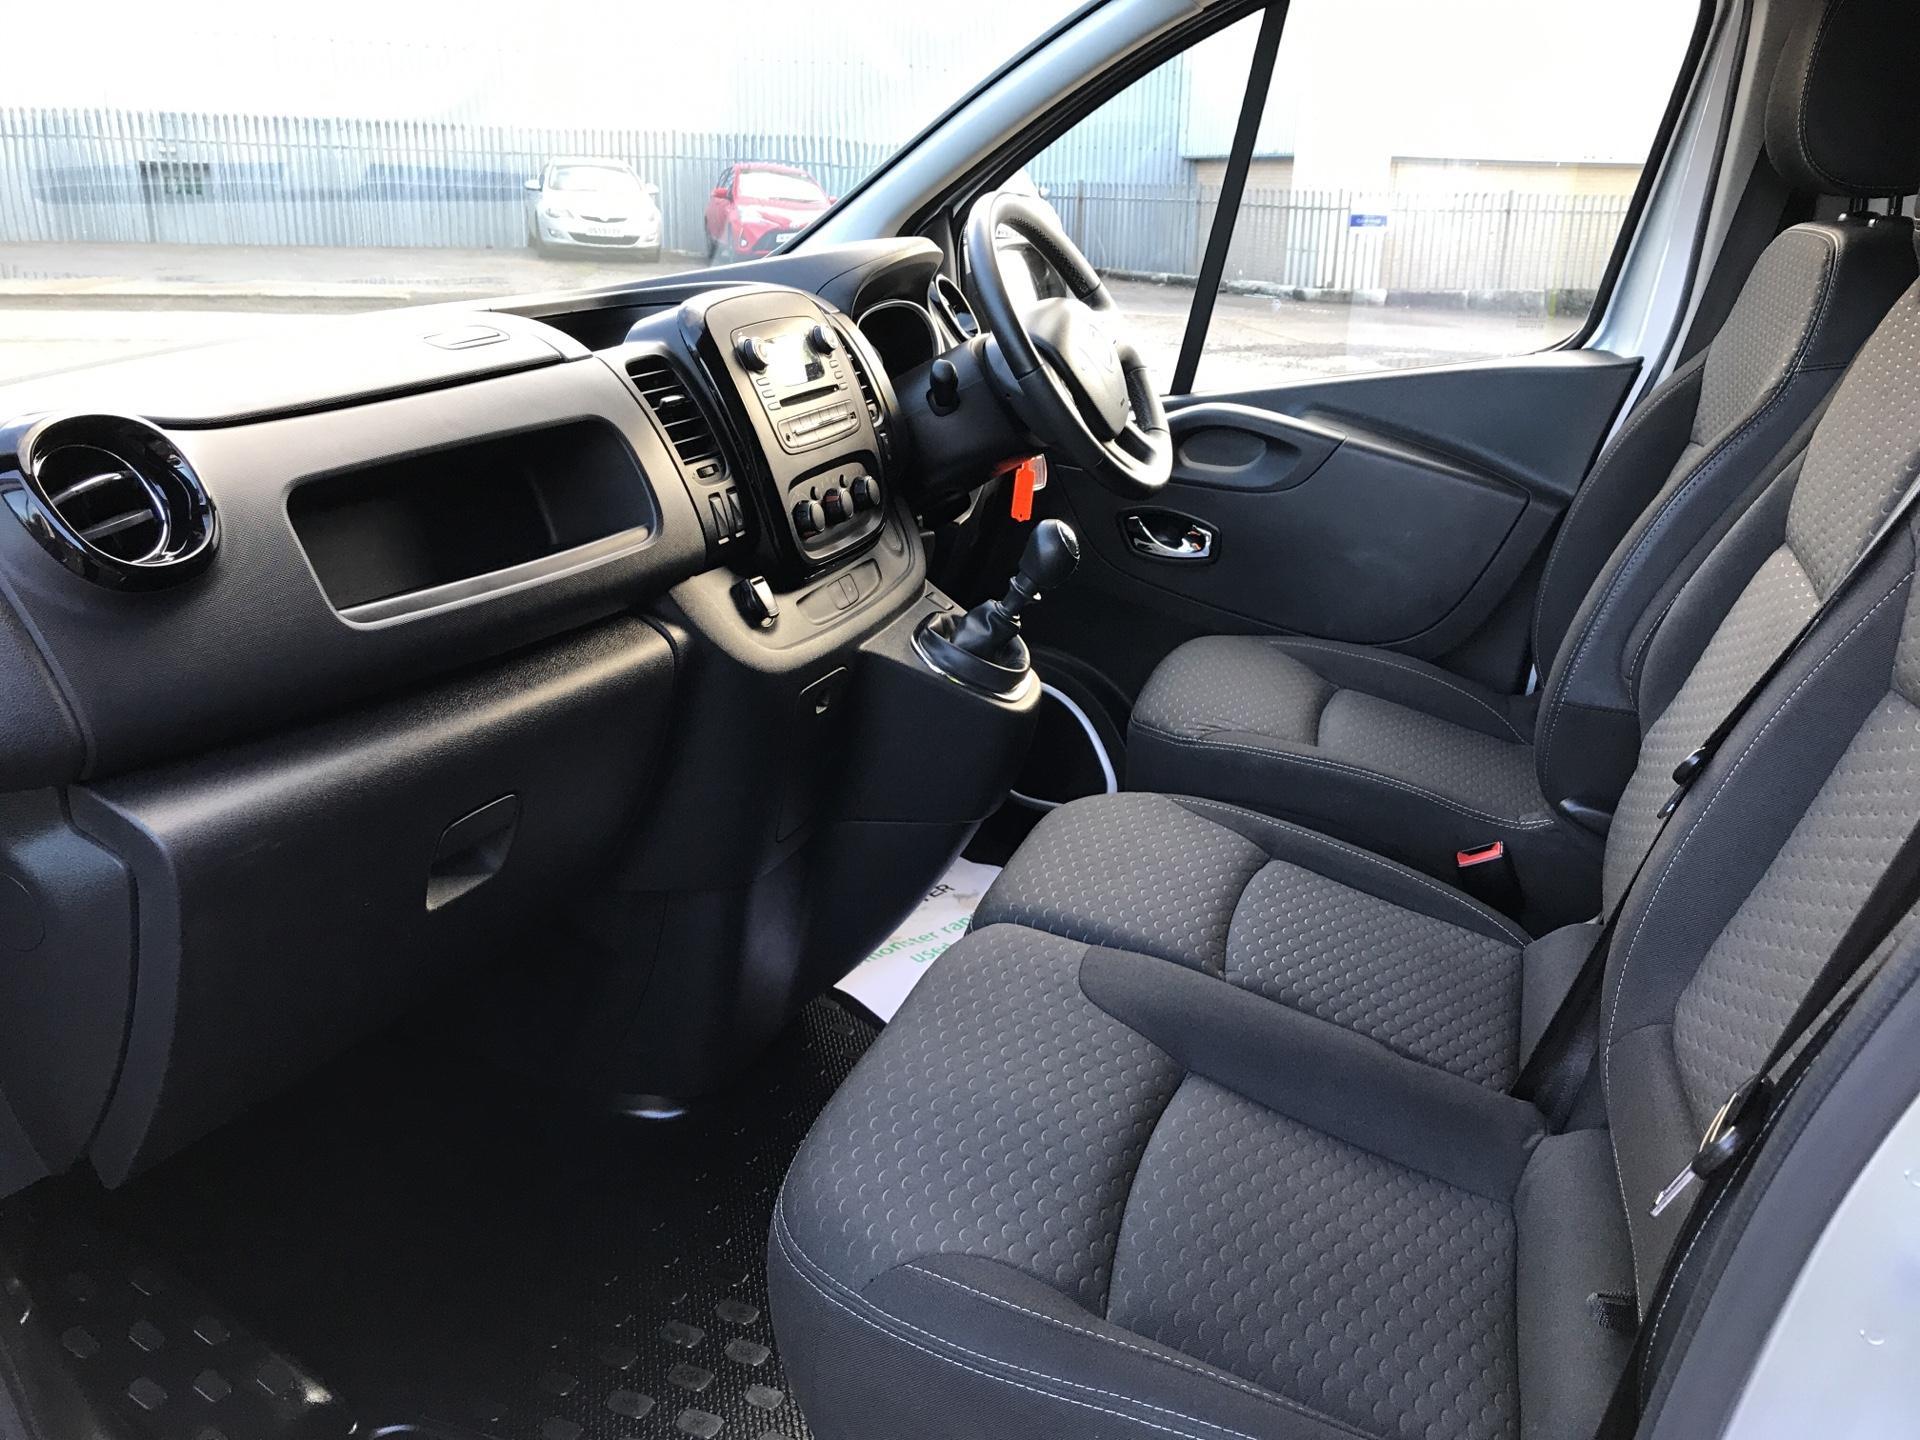 2017 Vauxhall Vivaro L1 H1 2700 1.6 CDTI 120PS SPORTIVE EURO 6 (ND17UNH) Image 14